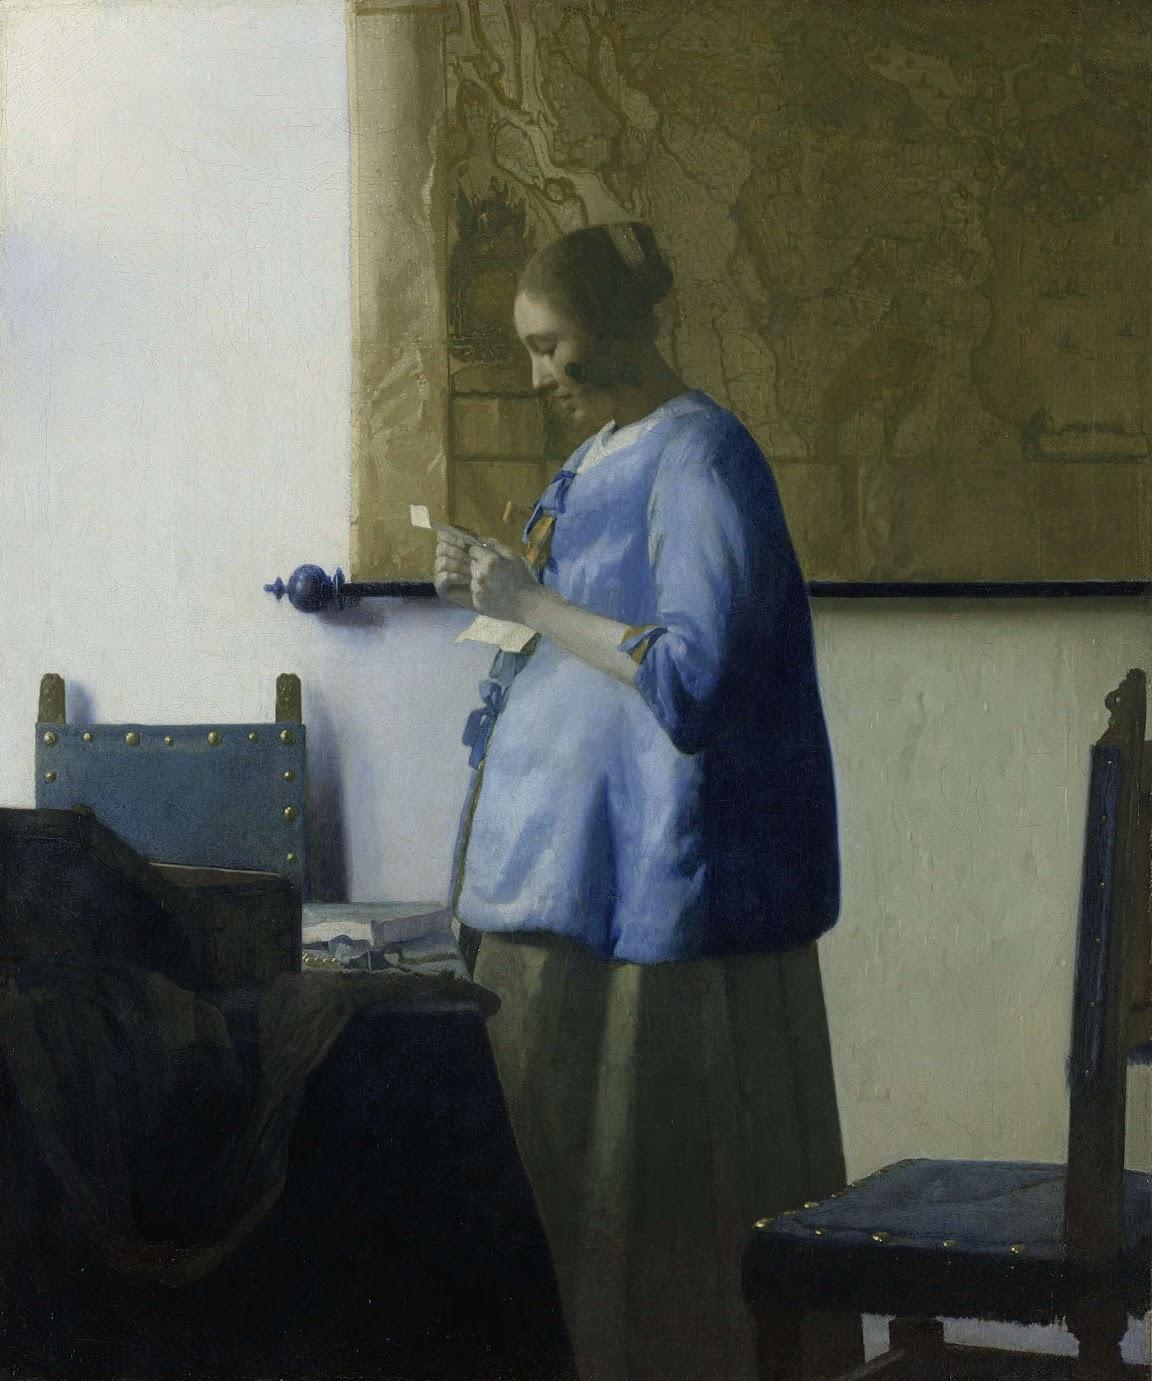 Lectora en azul, h. 1663-64, óleo sobre lienzo, 46,5 x 39 cm, Ámsterdam, Rijksmuseum.